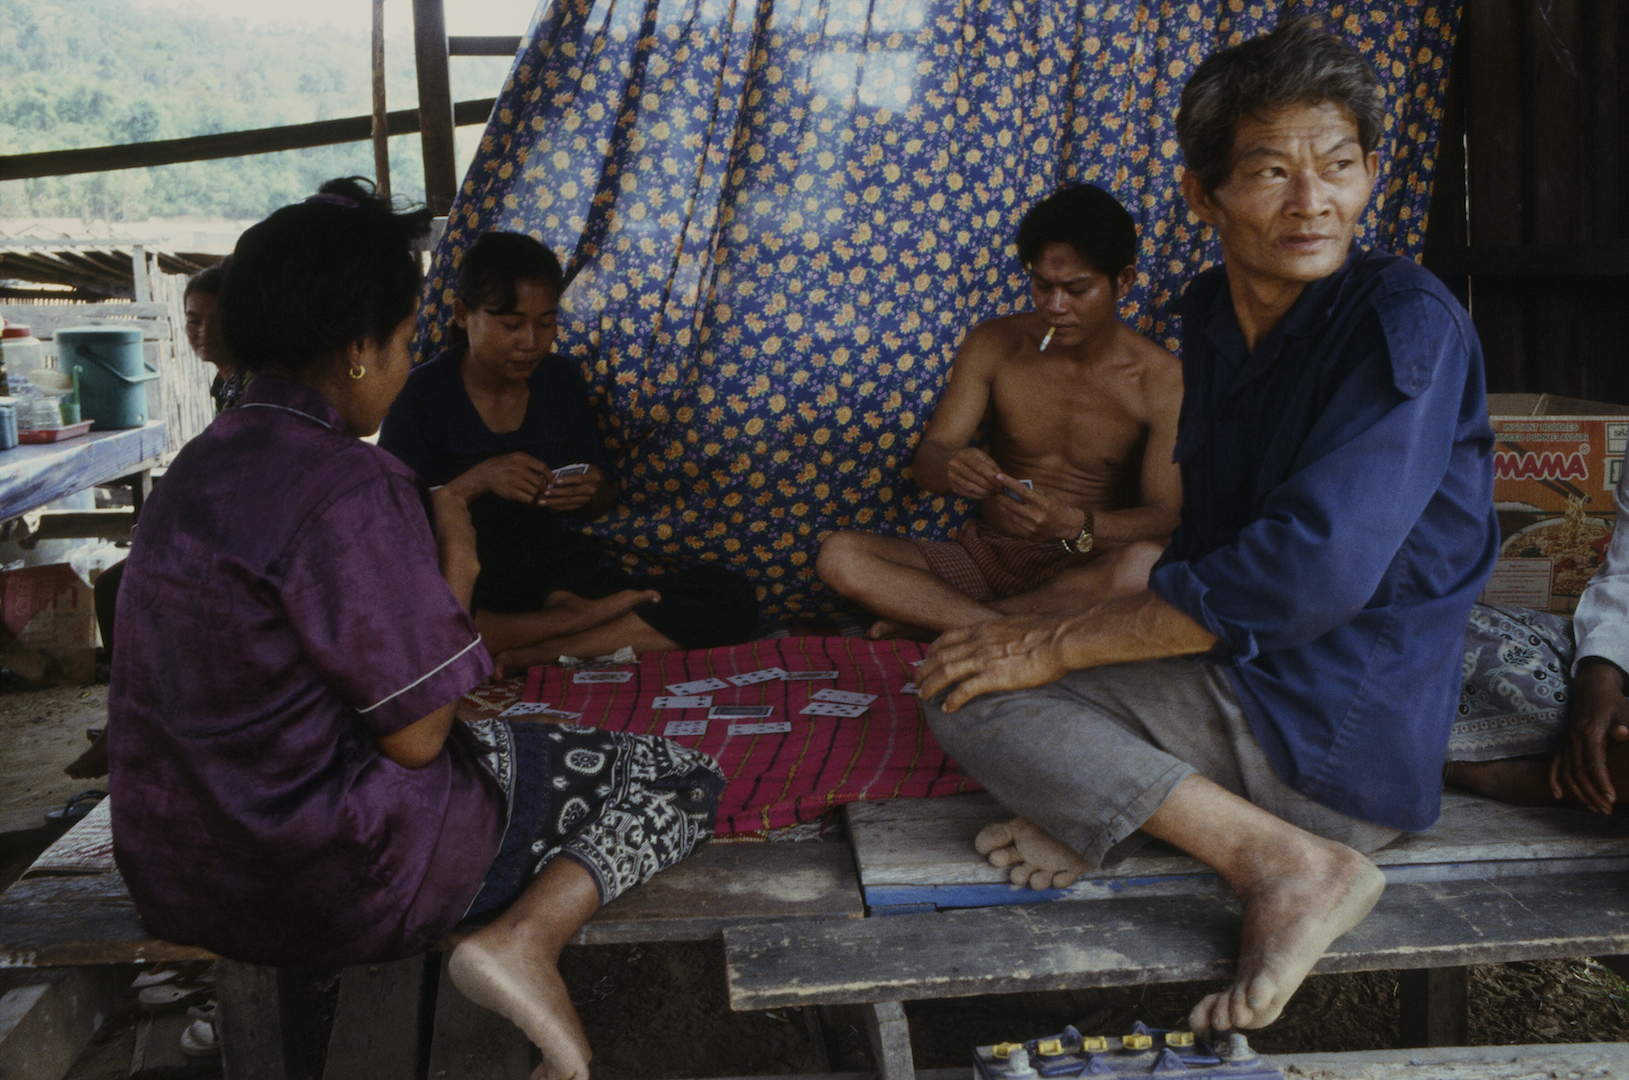 Partie de cartes à Tonglé Sap au Cambodge. (Copyright : Bruno Birolli)